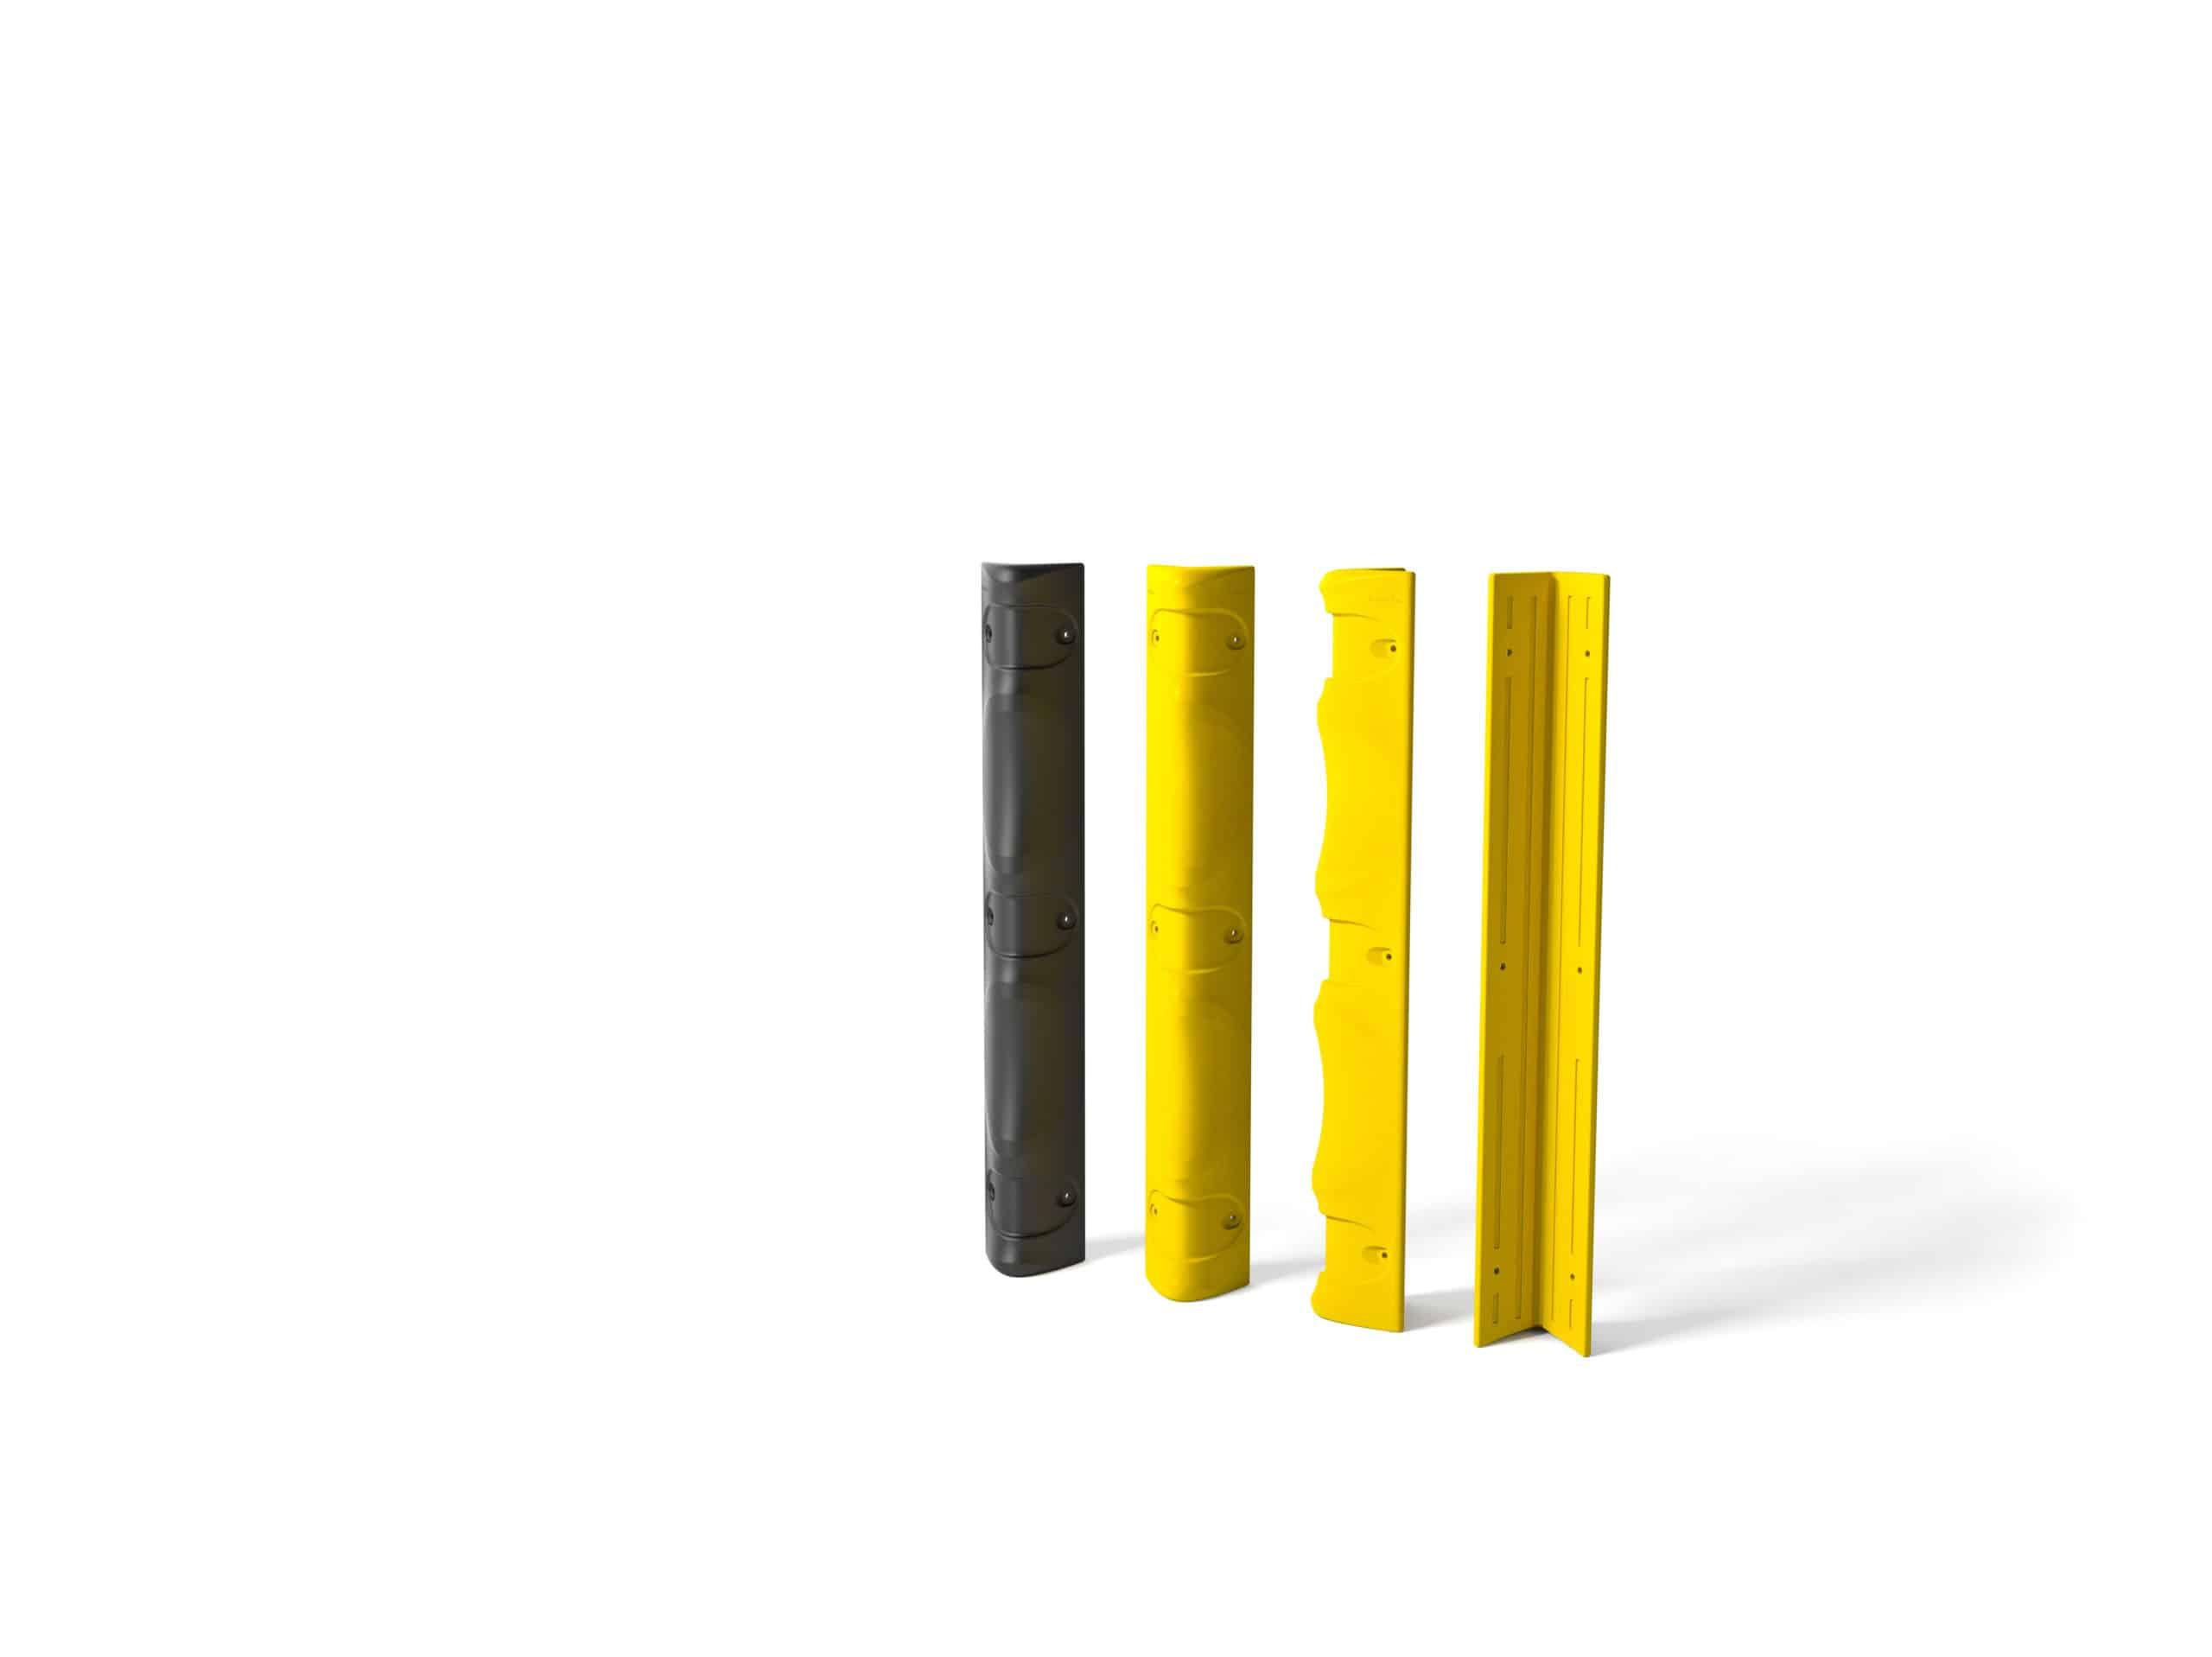 Eckanfahrschutz für Säule boplan® Kantenschutz gelb 1.000x100x100 mm